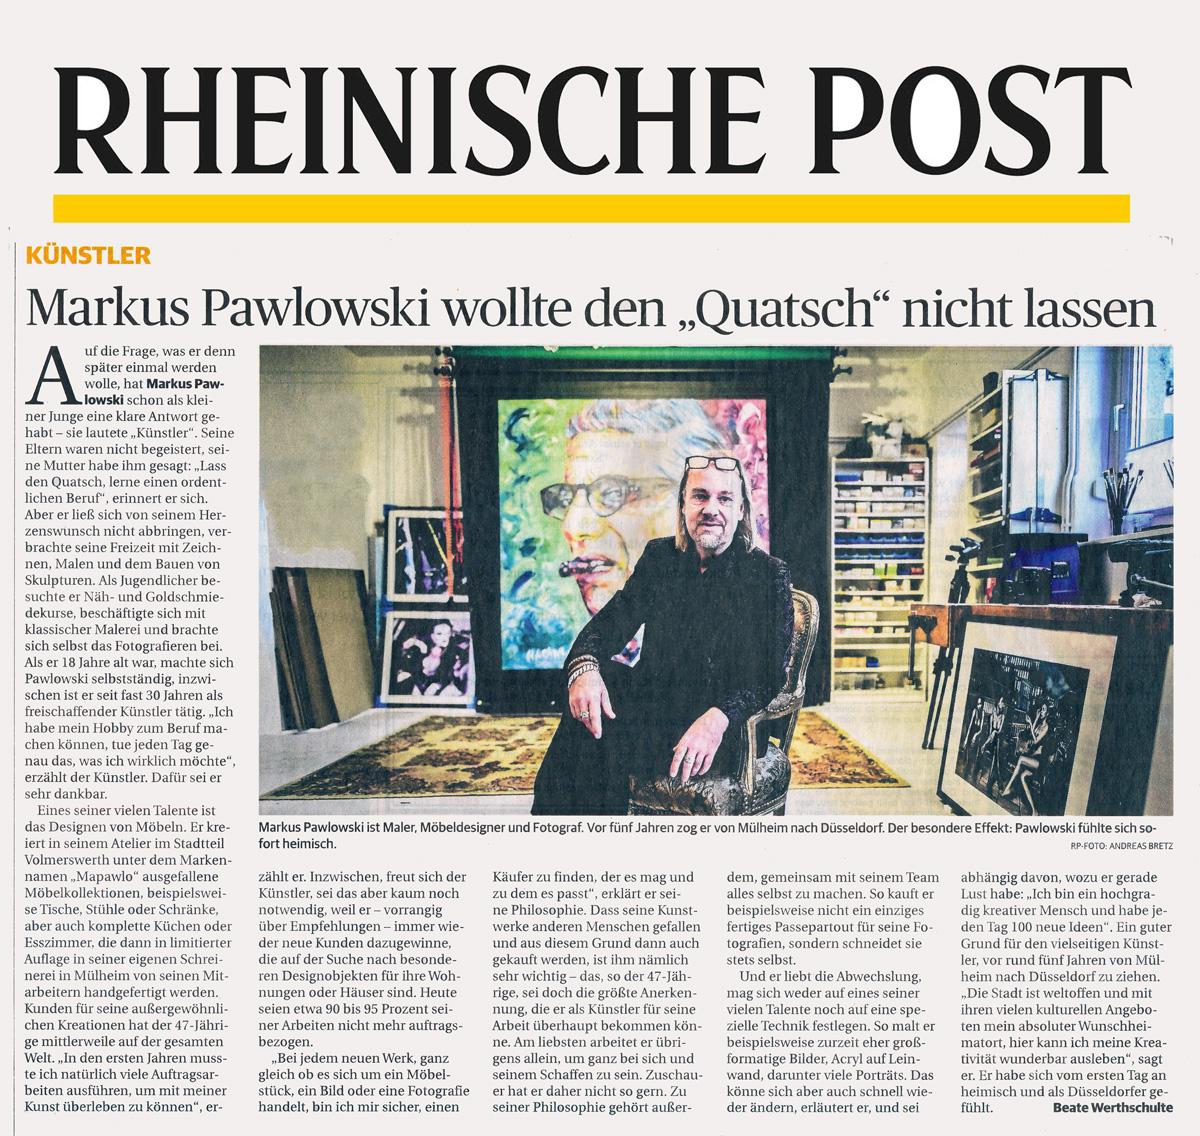 mapawlo Markus pawlowski presse